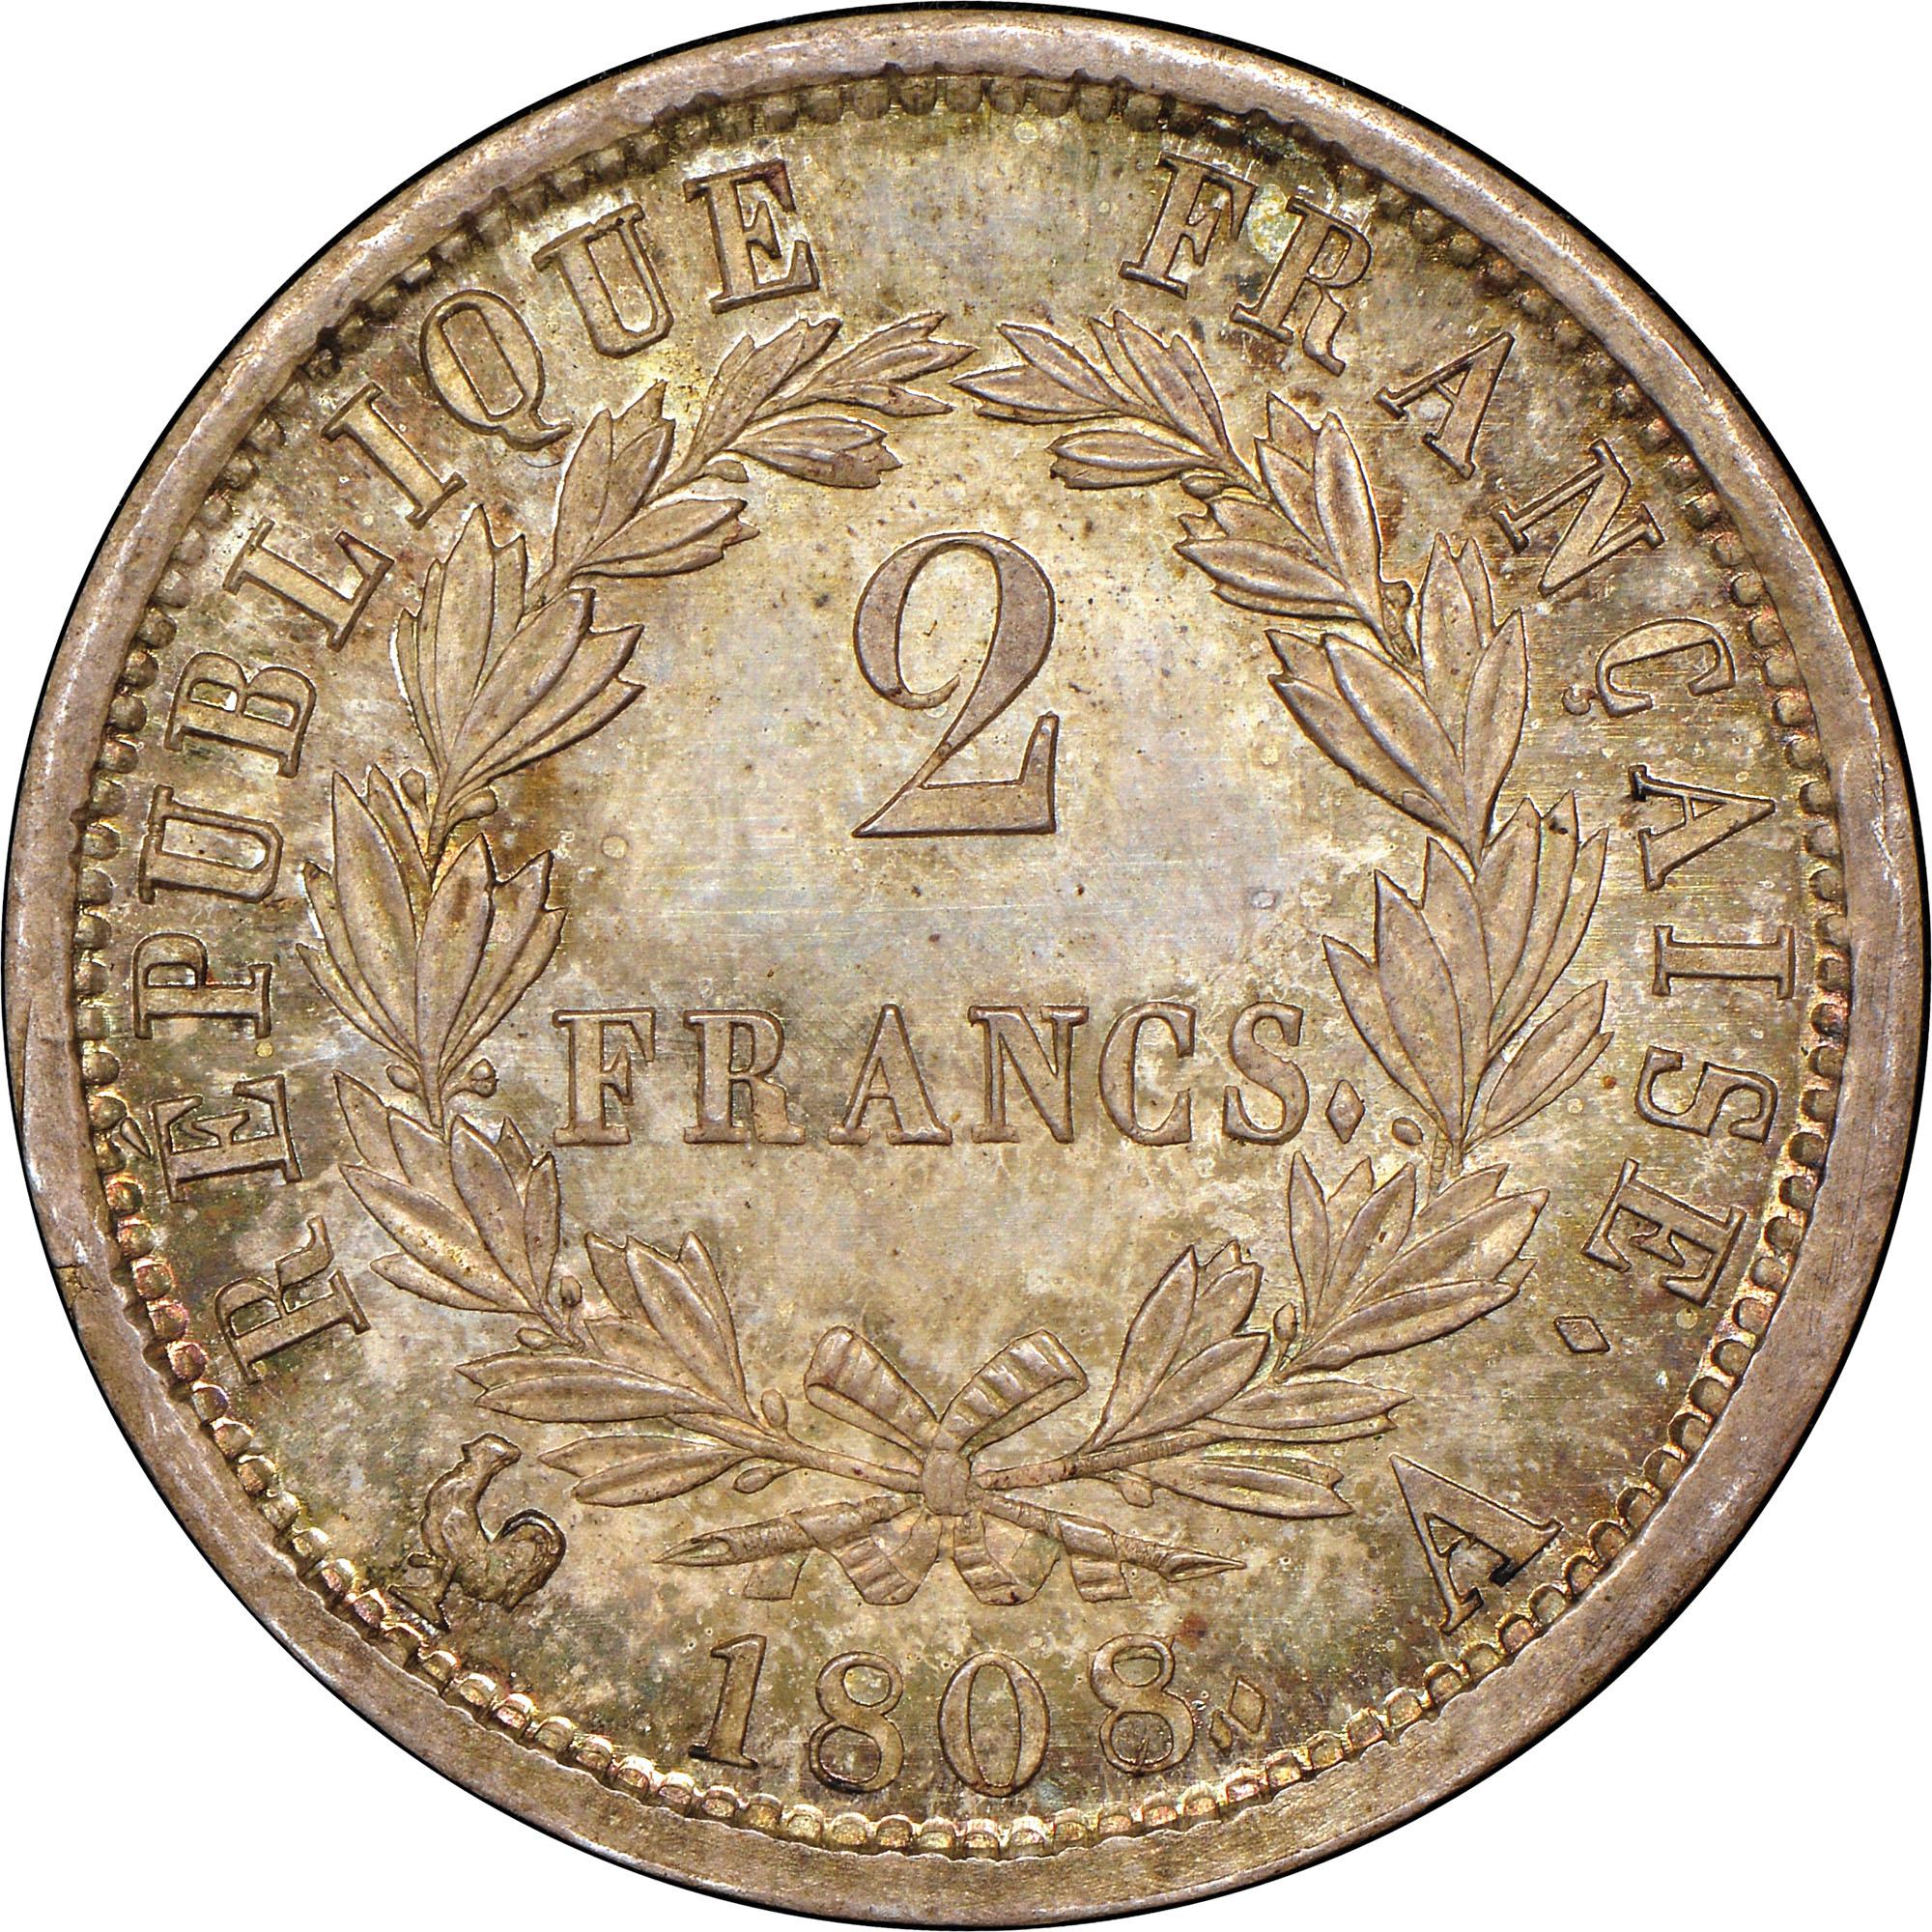 France 2 Francs reverse